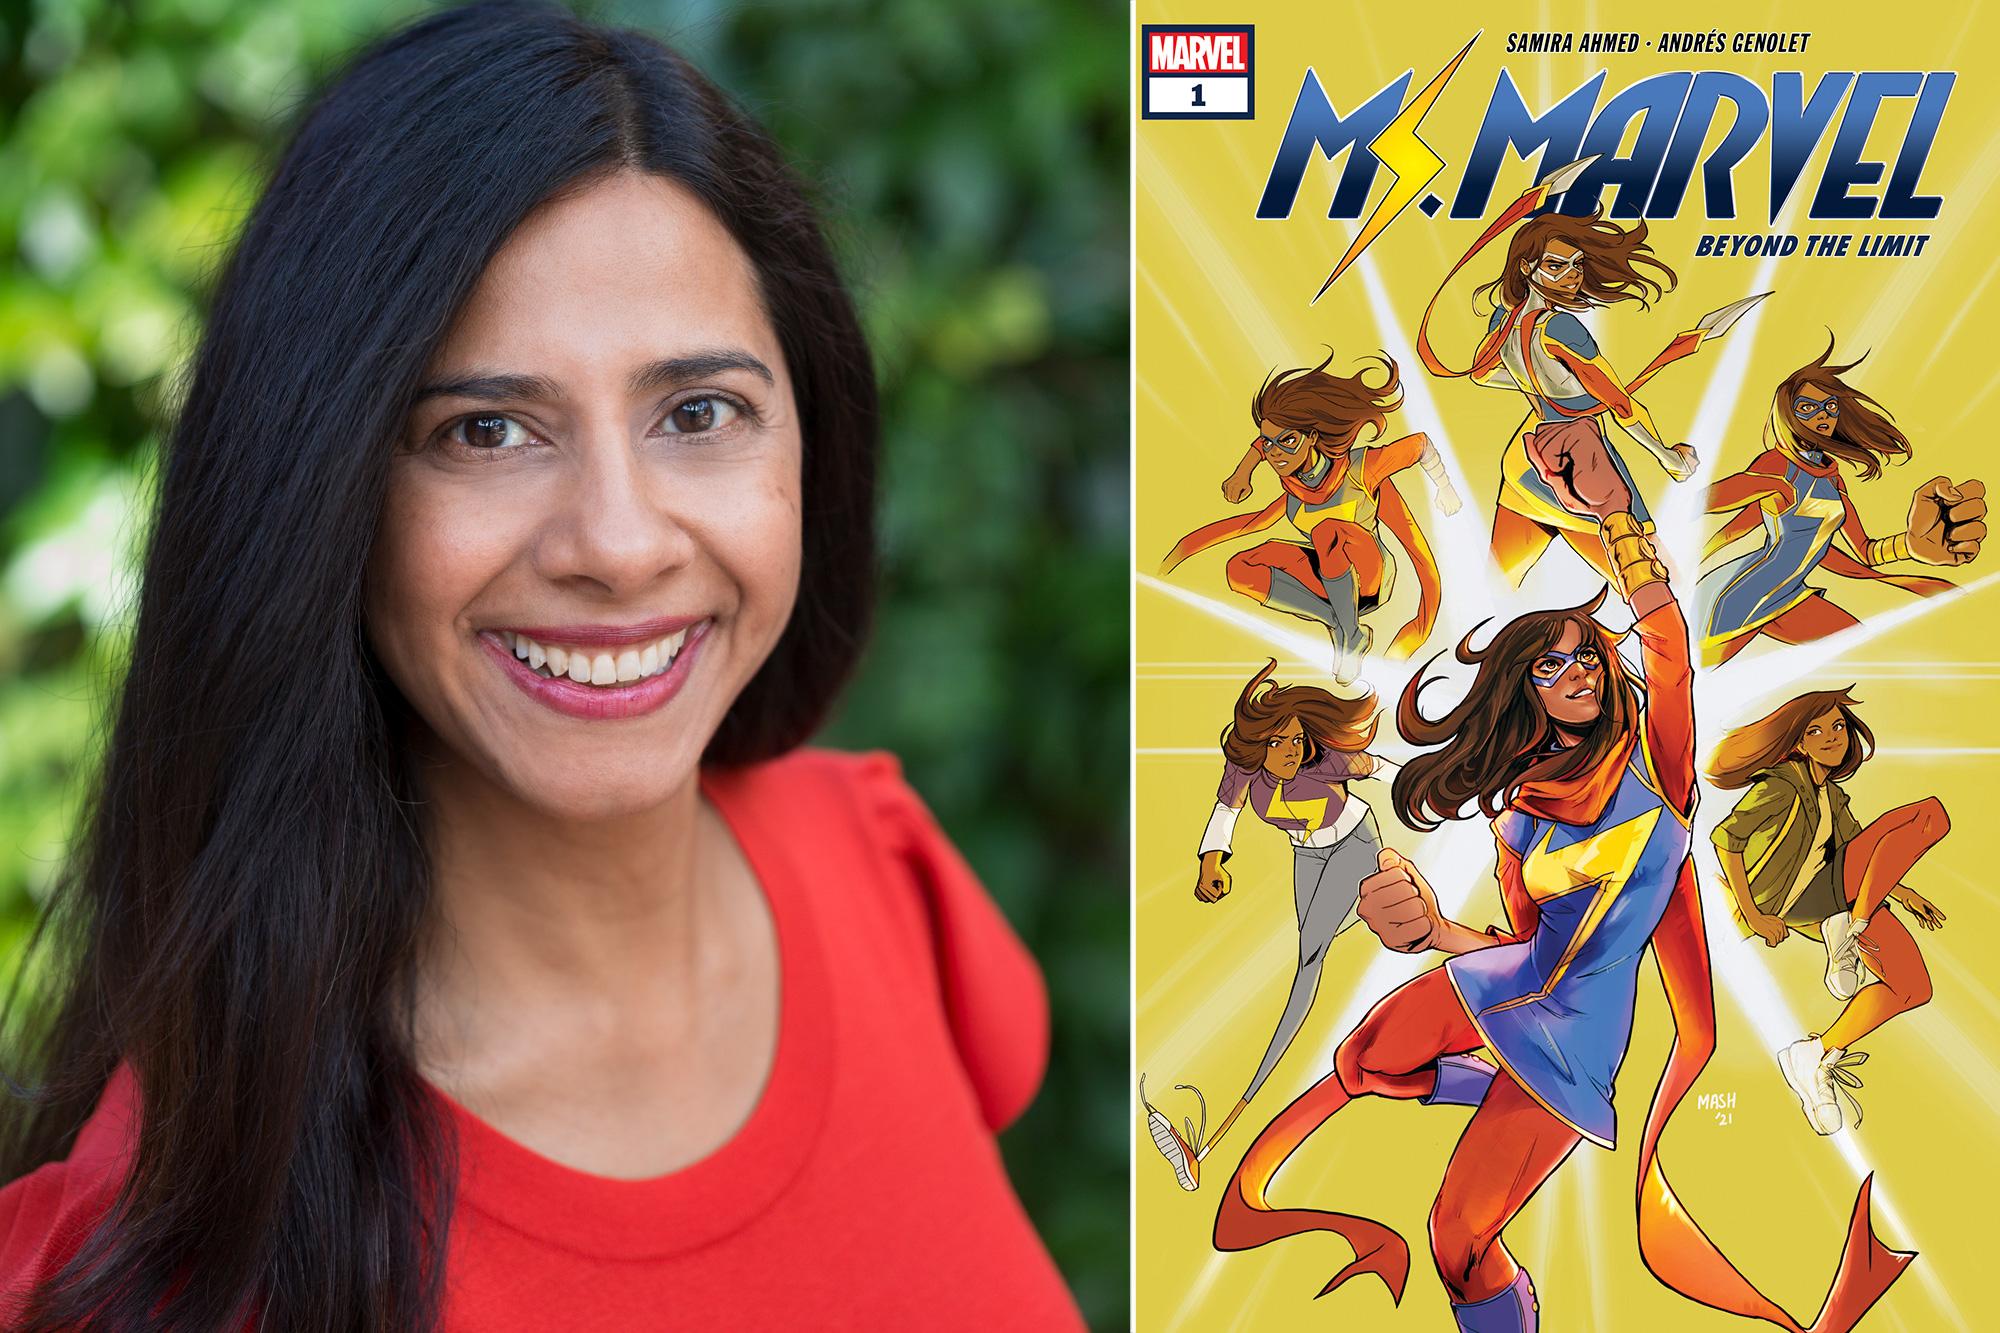 Samira Ahmed, Ms Marvel